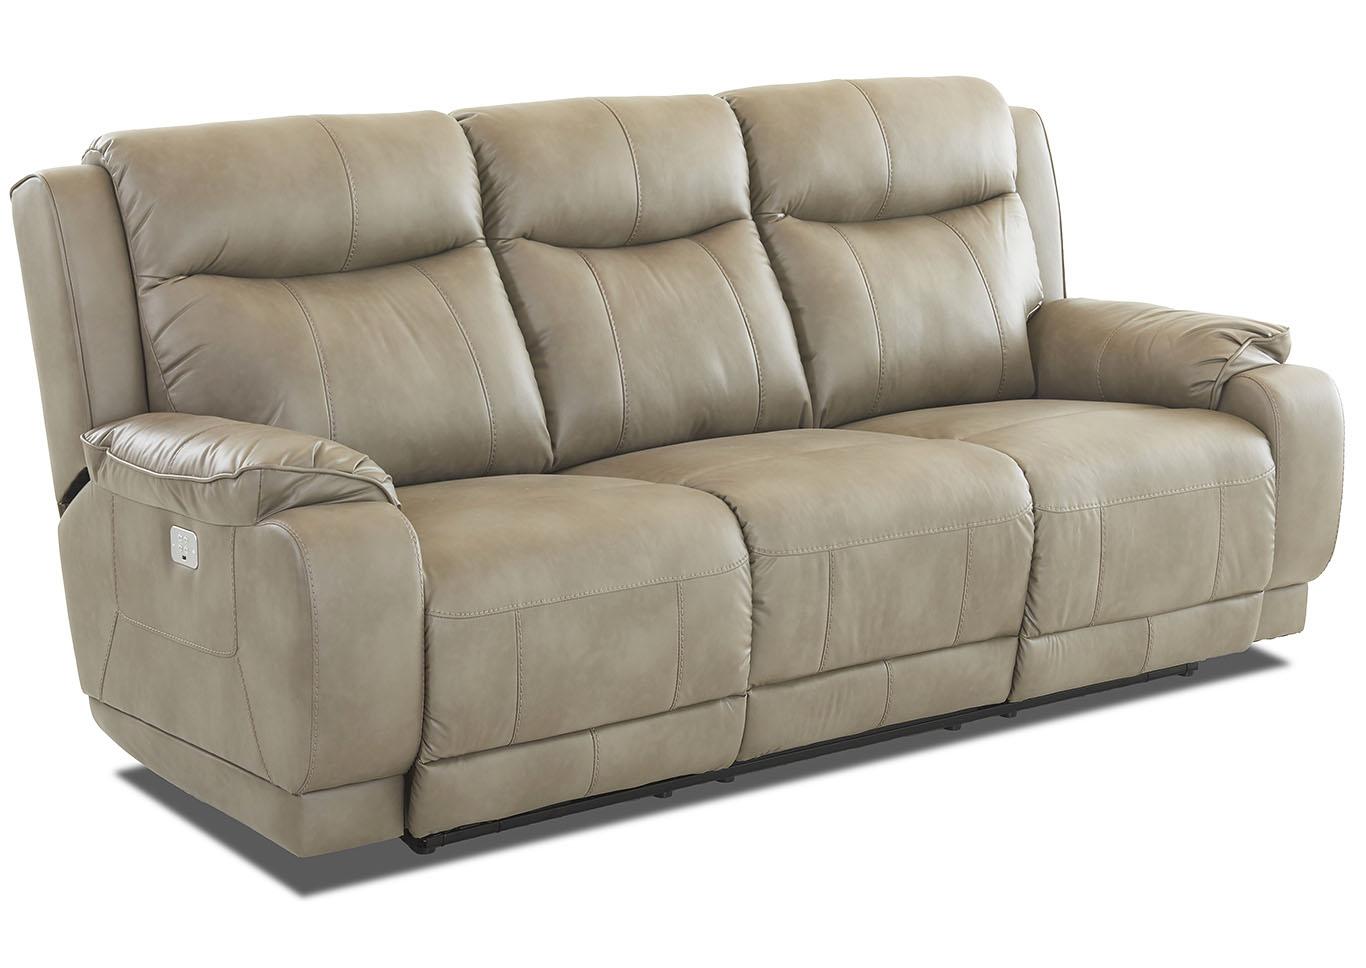 Signature Furniture - NJ Humphrey Putty Reclining Leather Sofa